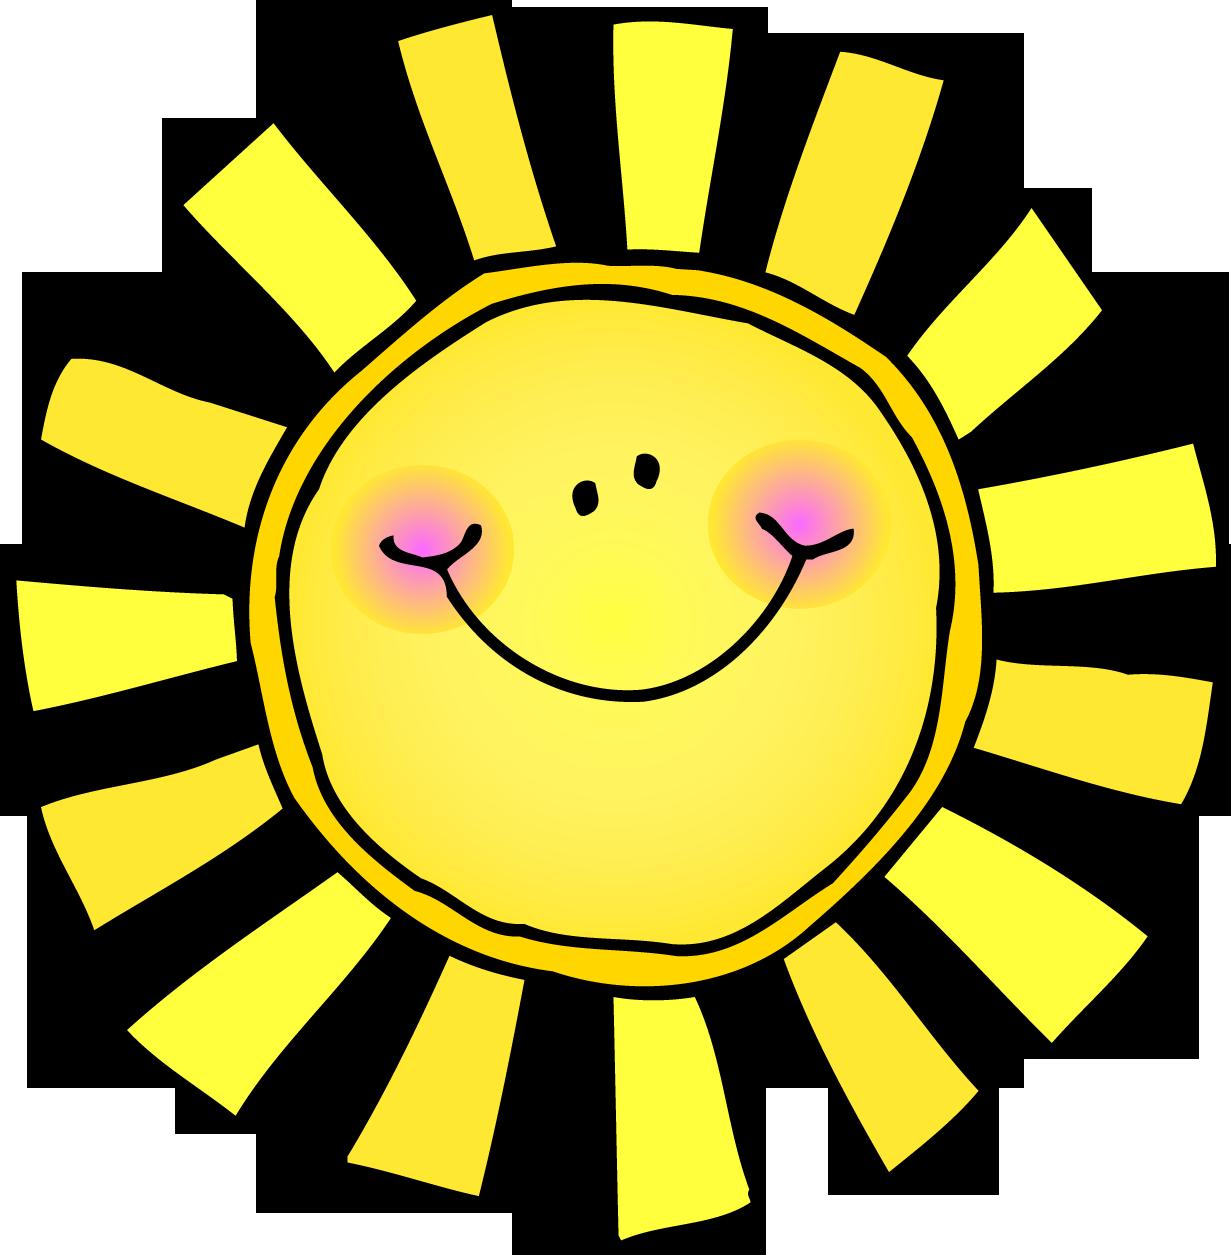 realistic animated weather icons EzNZLHv